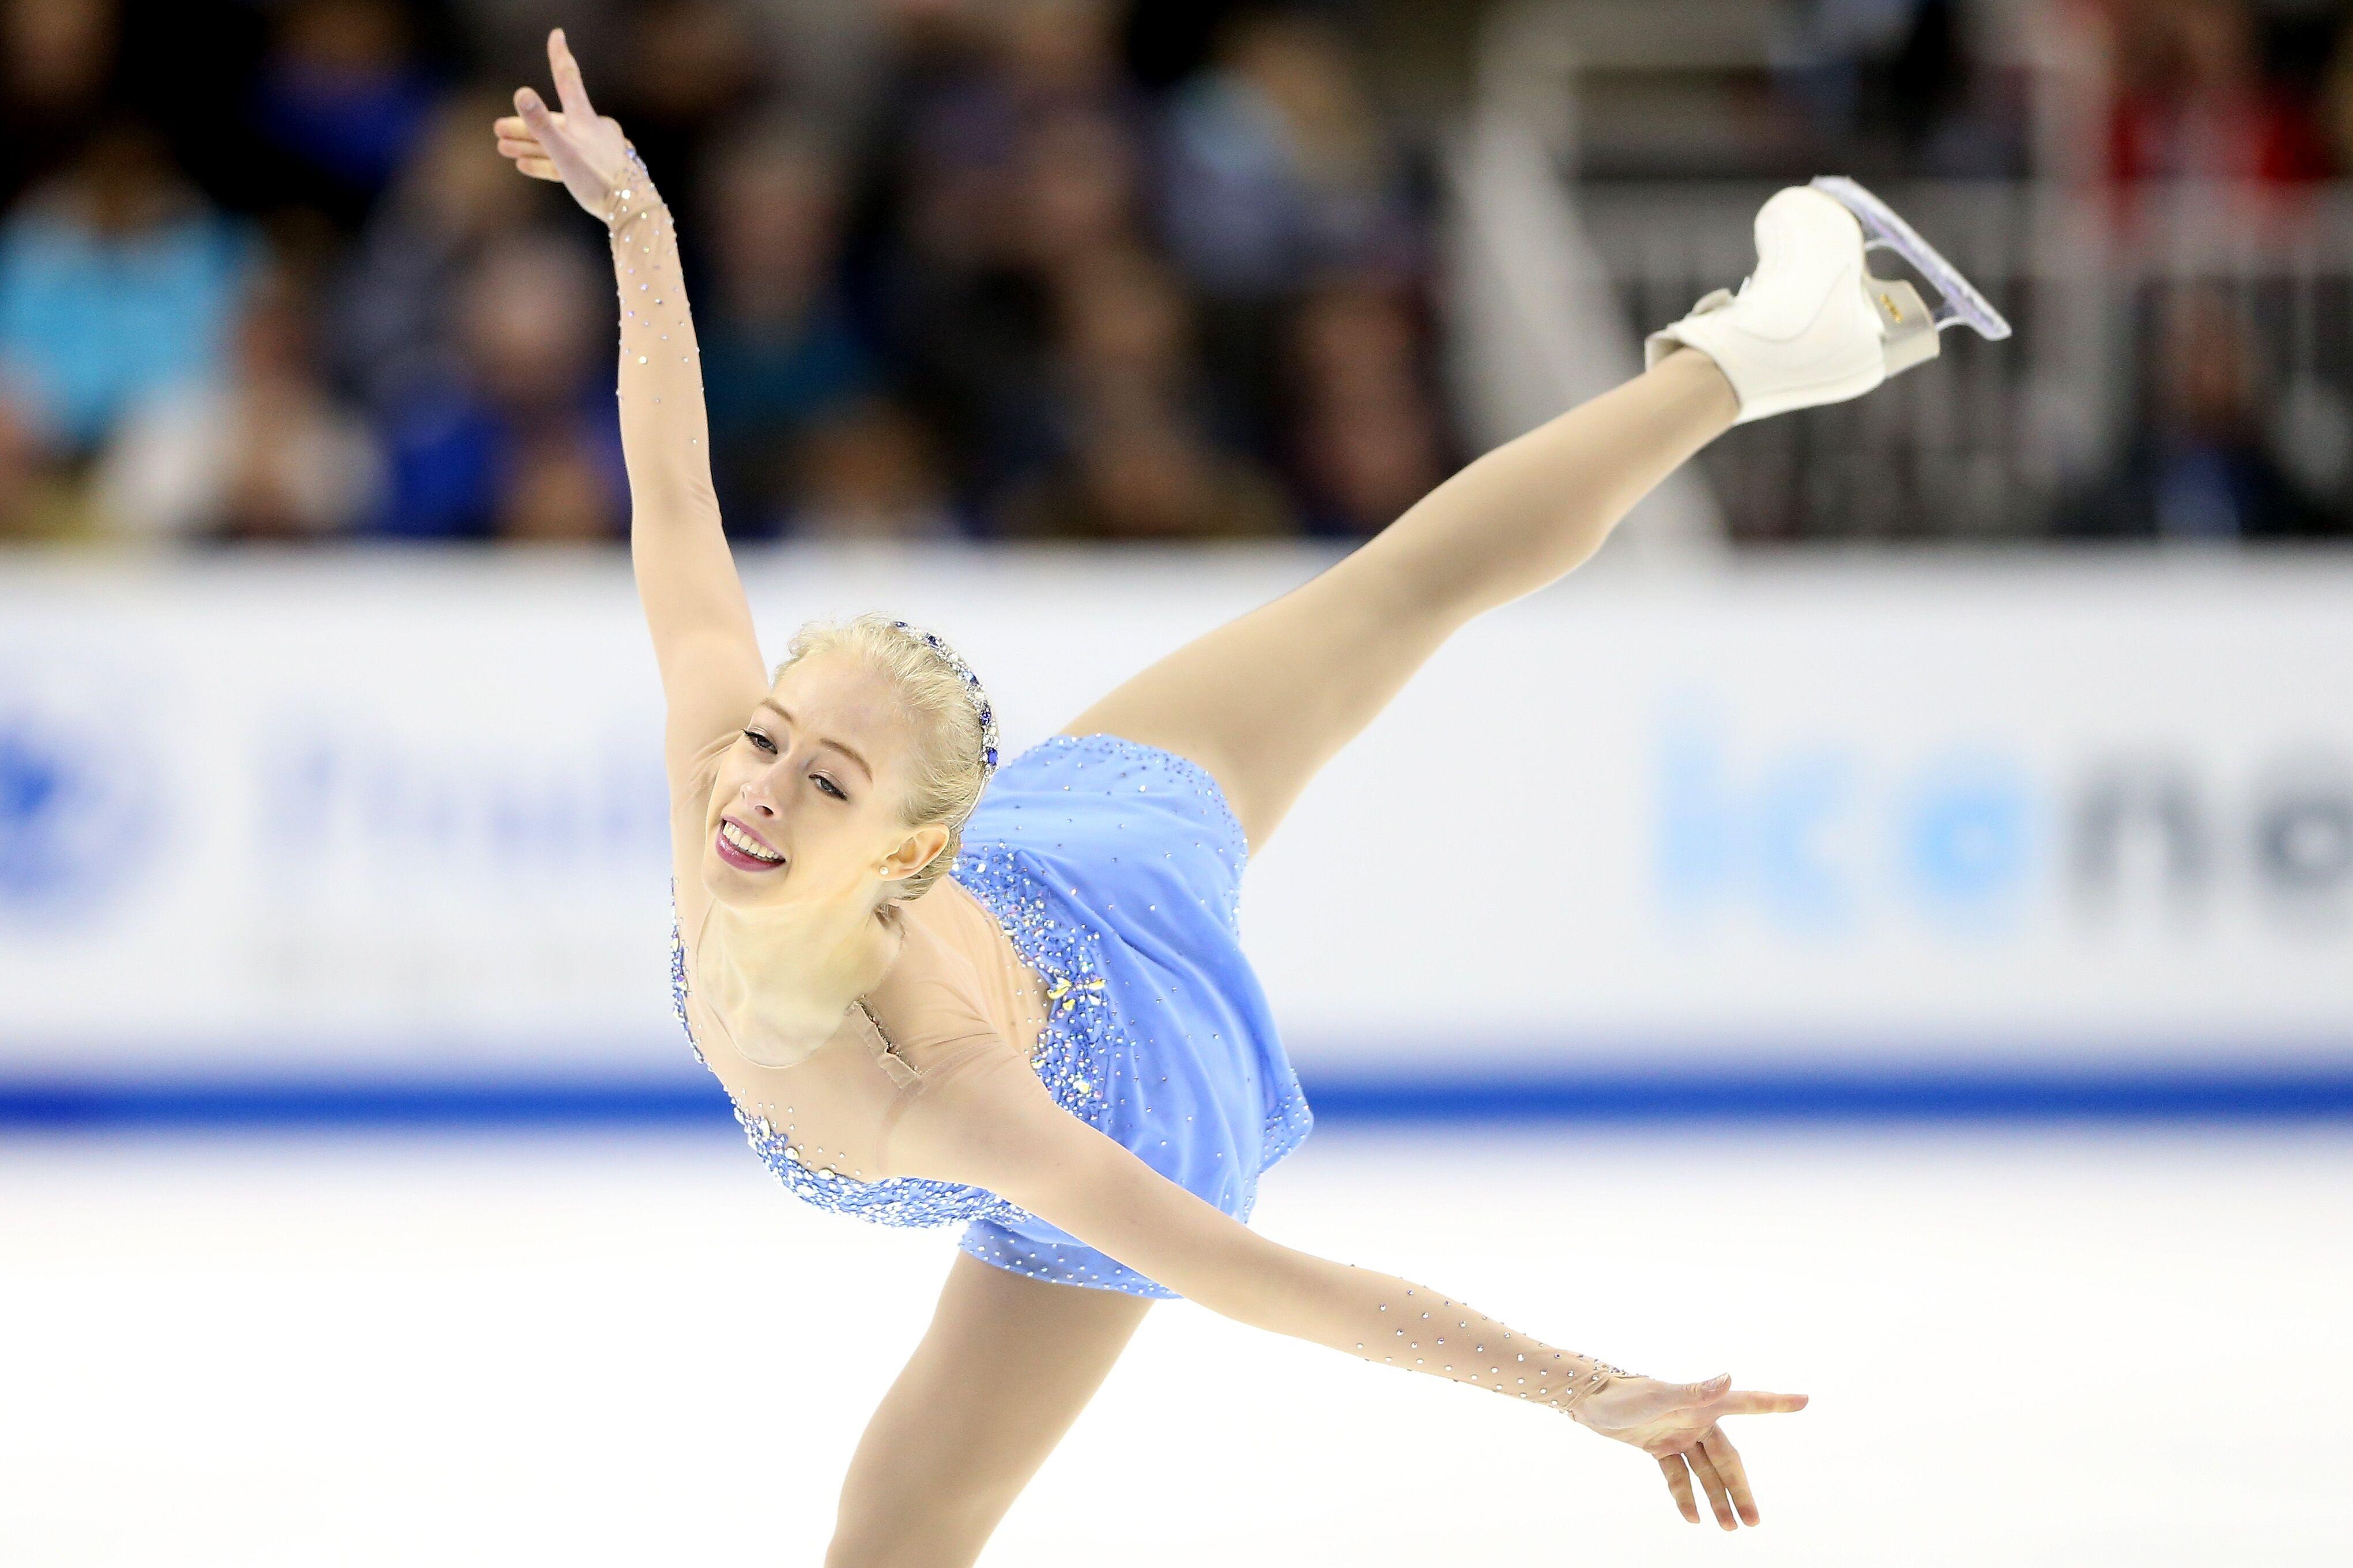 Olympics live stream: Watch women's figure skating free ...